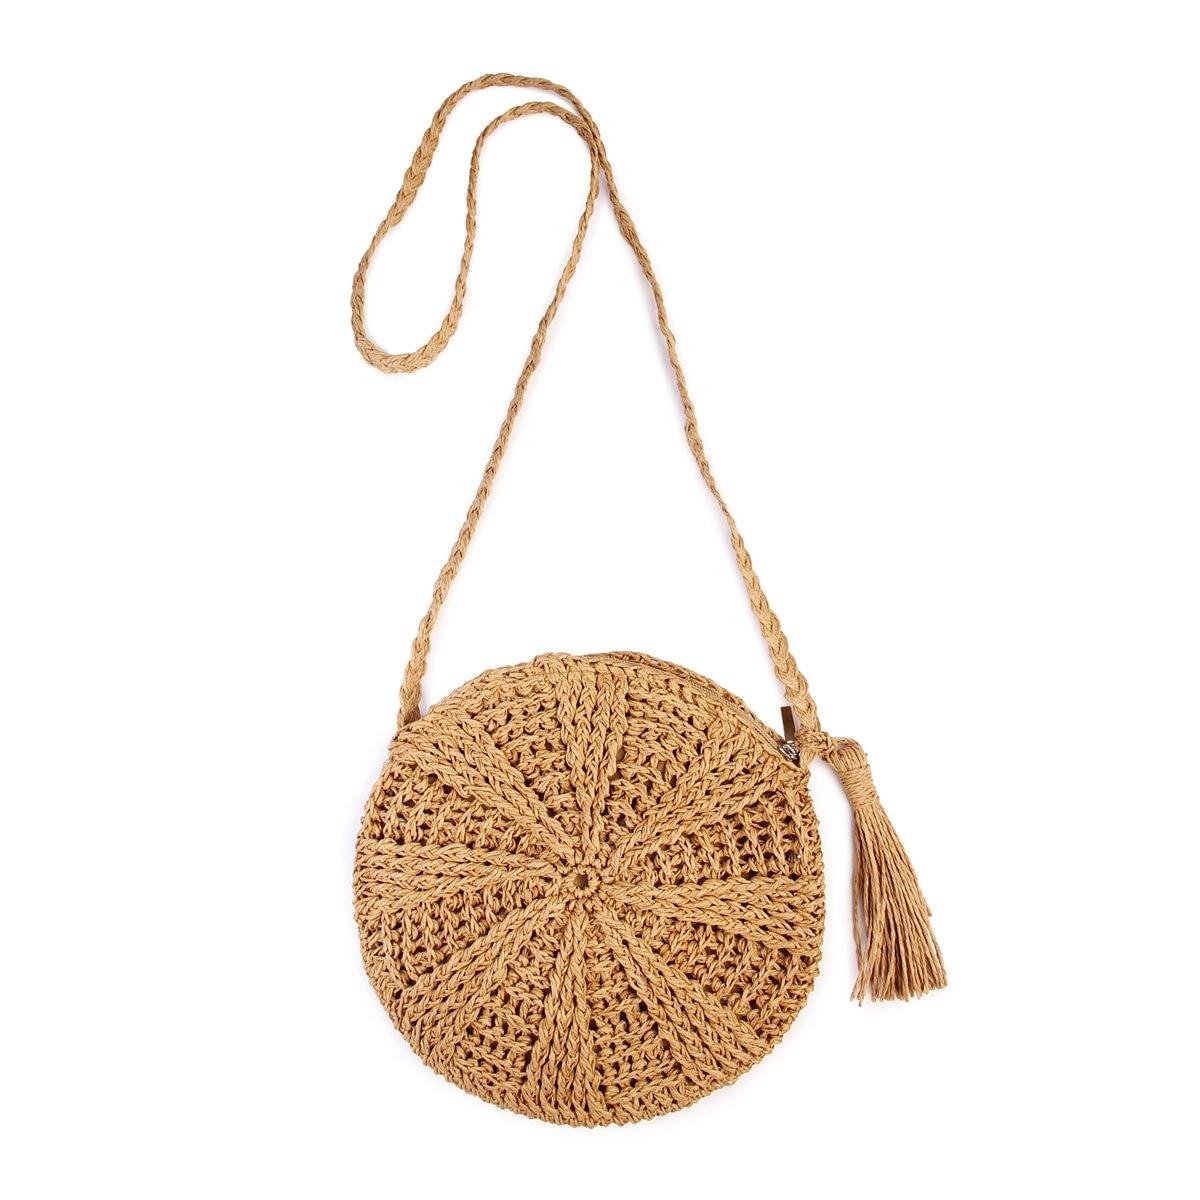 Rattan Crochet Straw Woven Basket Bali Handbag Round Circle Crossbody Shopper Beach Tote Bag Light Brown